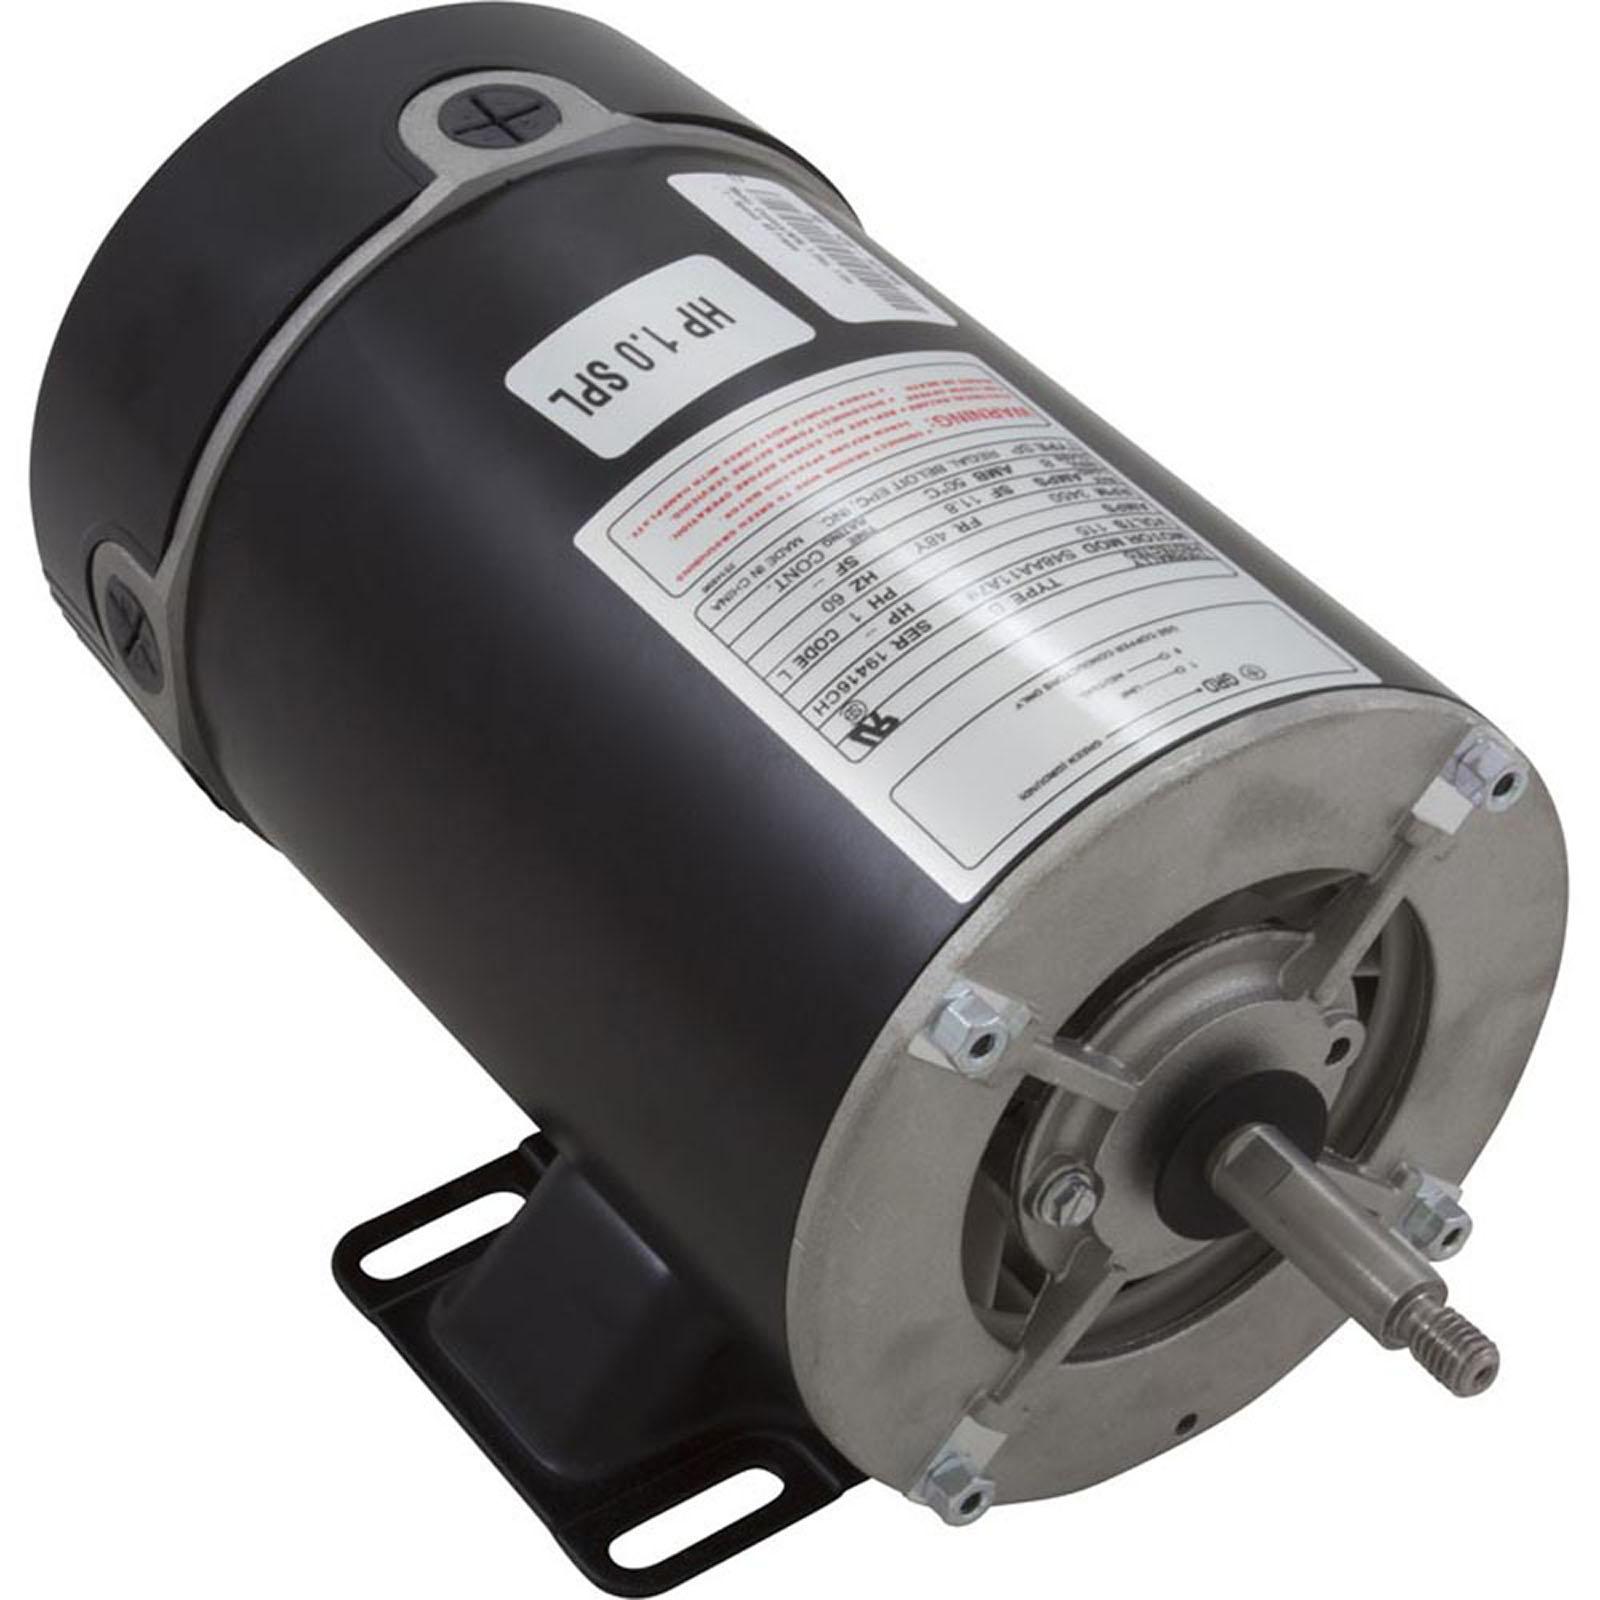 Bn25 motor 48 frame thru bolt 1 0 hp 115 volts 1 speed for Ao smith motor catalog